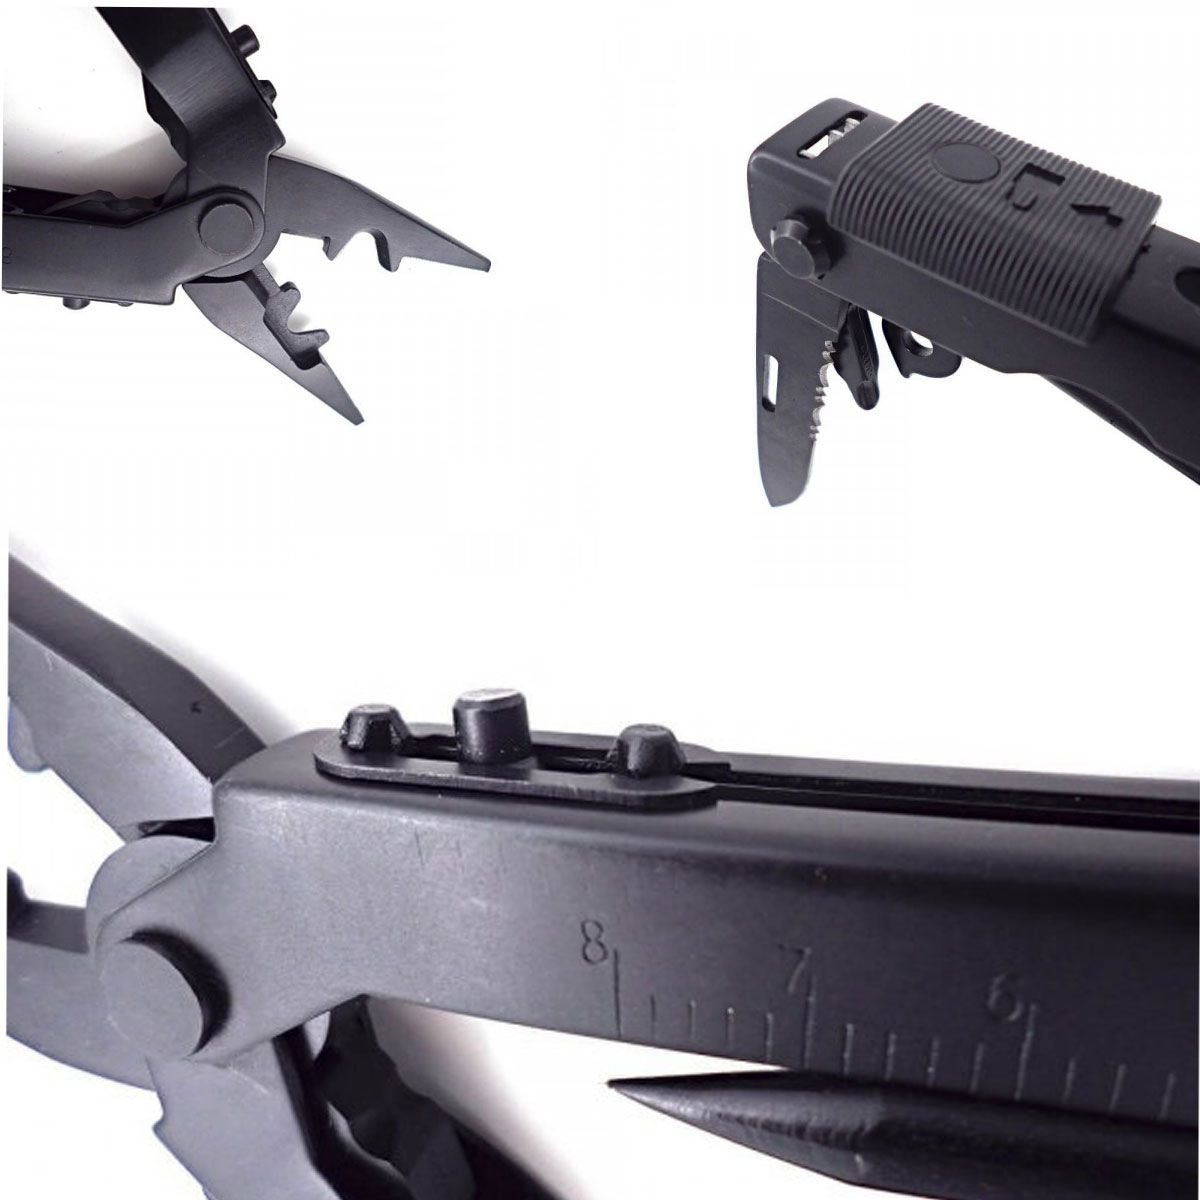 Alicate Armais Multifuncional Preto 8300A-B